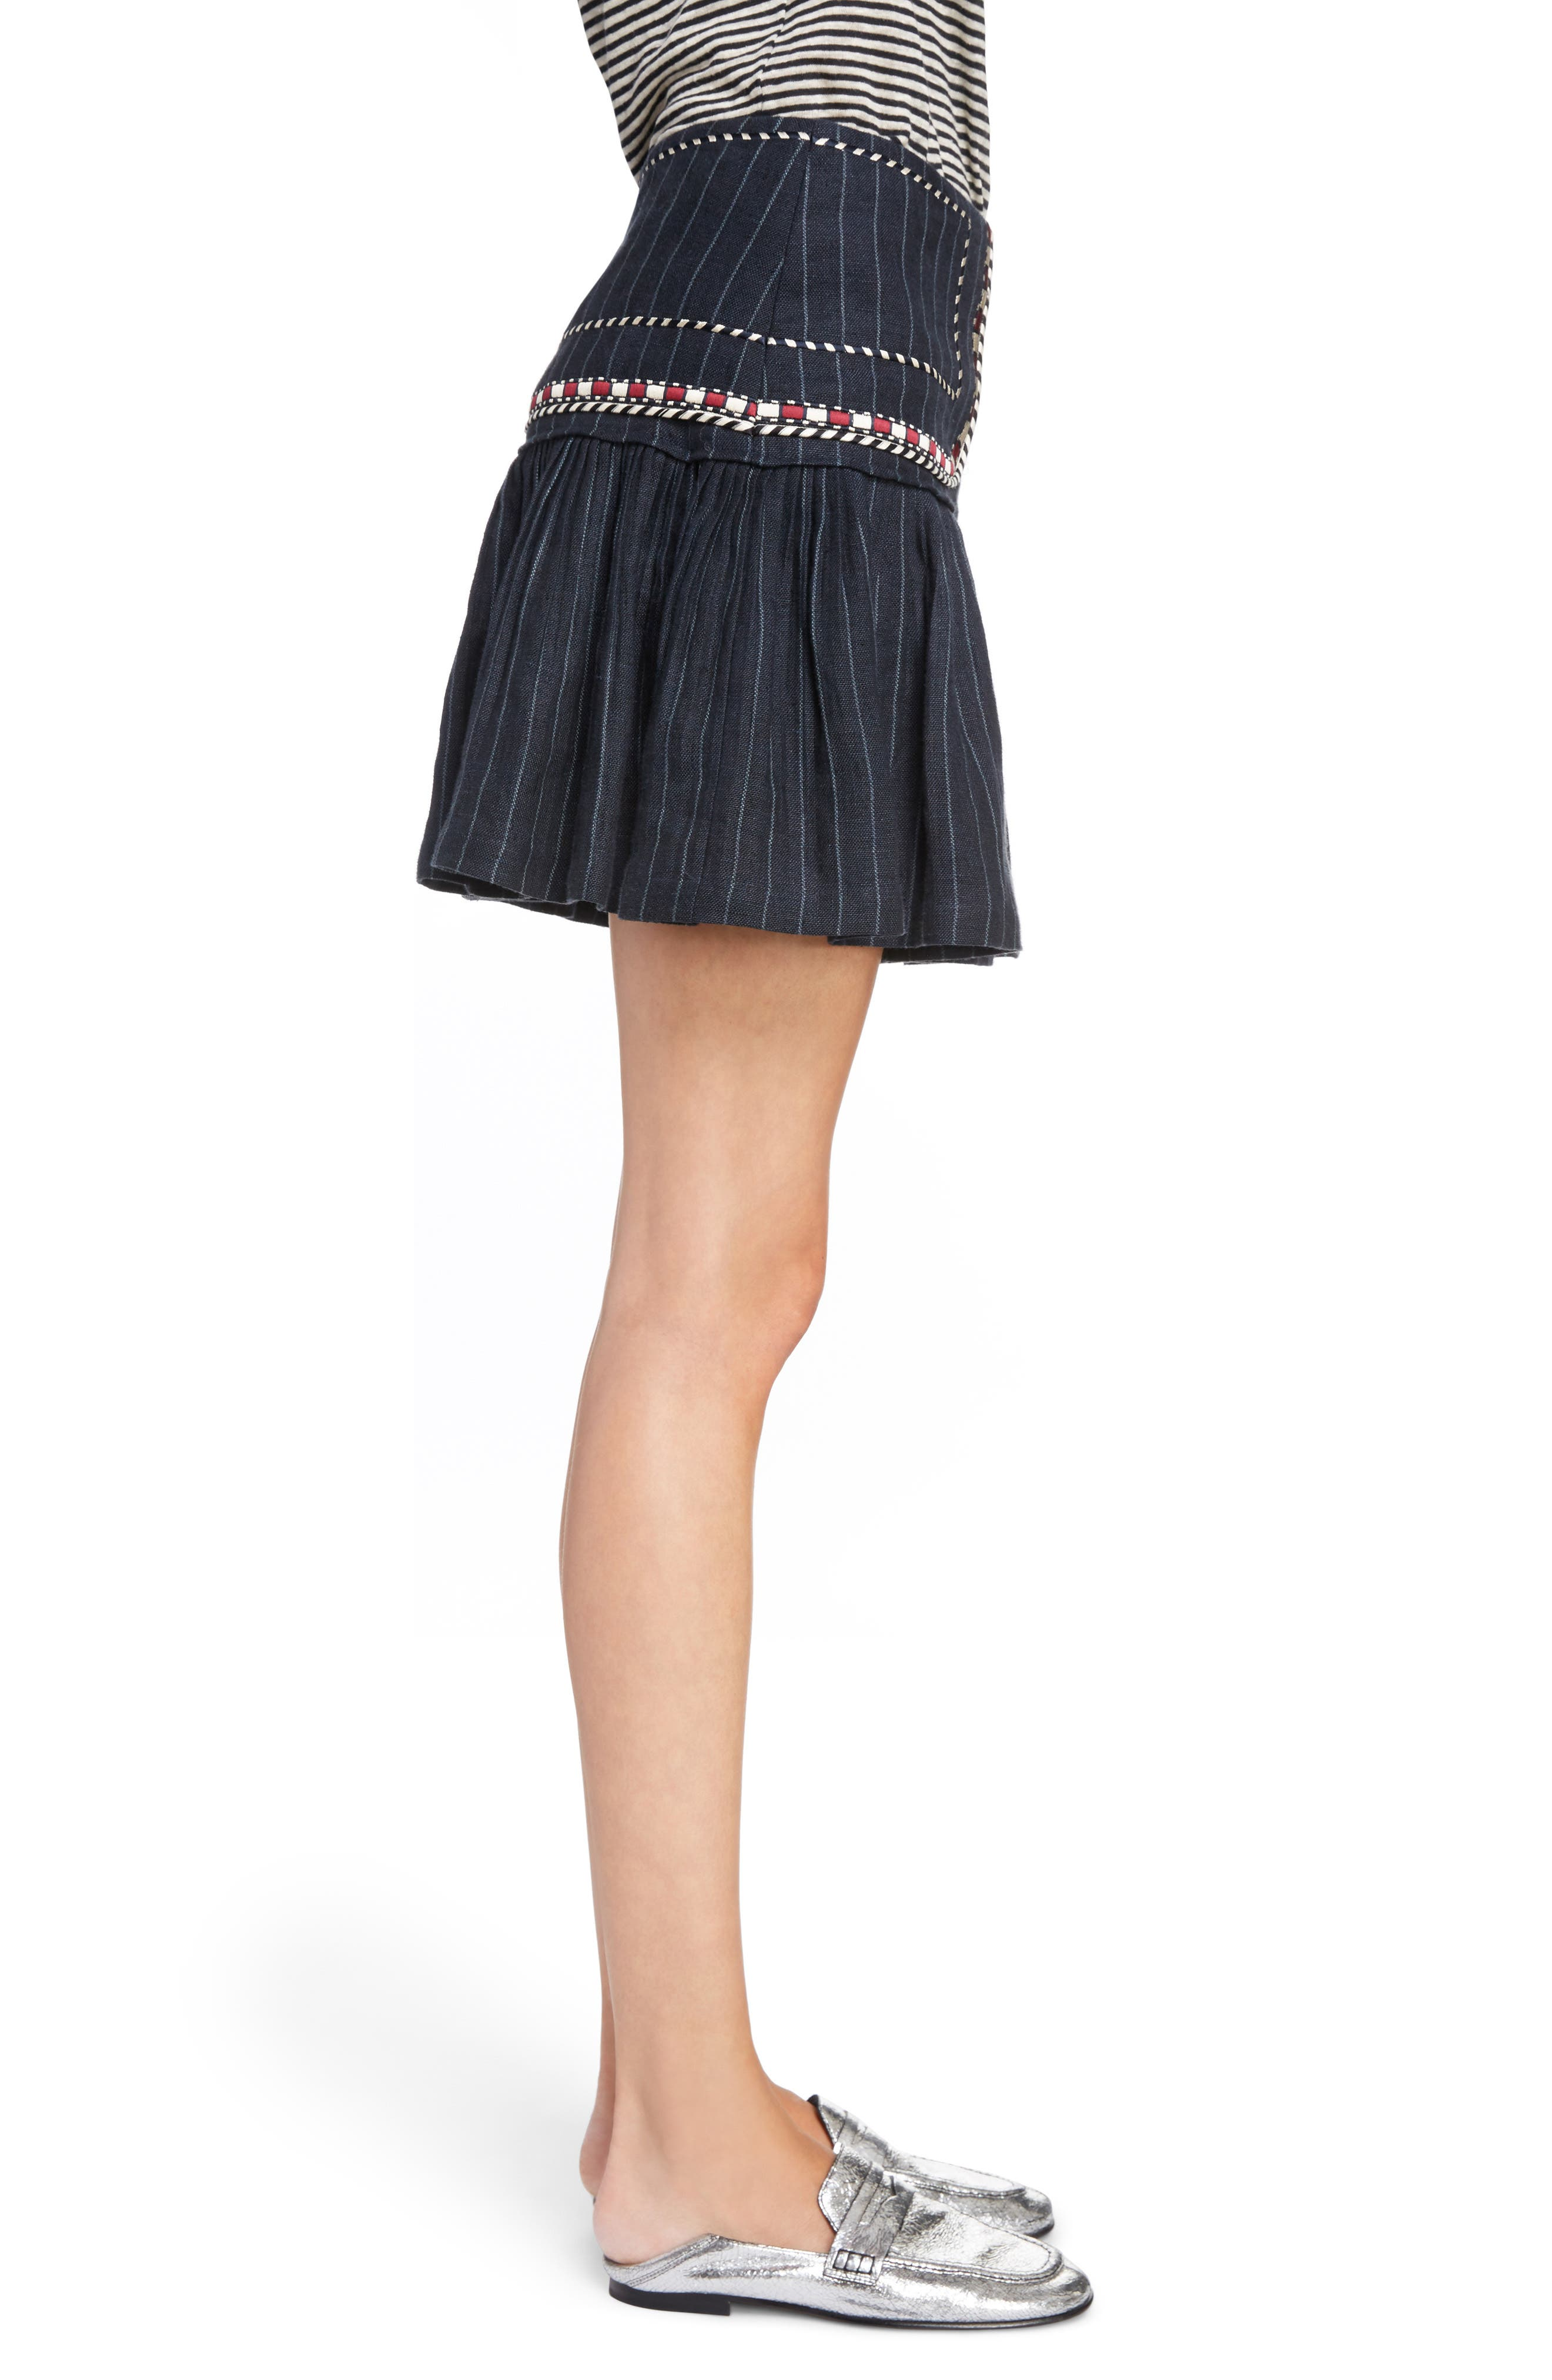 Isabel Marant Étoile Jessie Embroidered Linen Skirt,                             Alternate thumbnail 3, color,                             Midnight